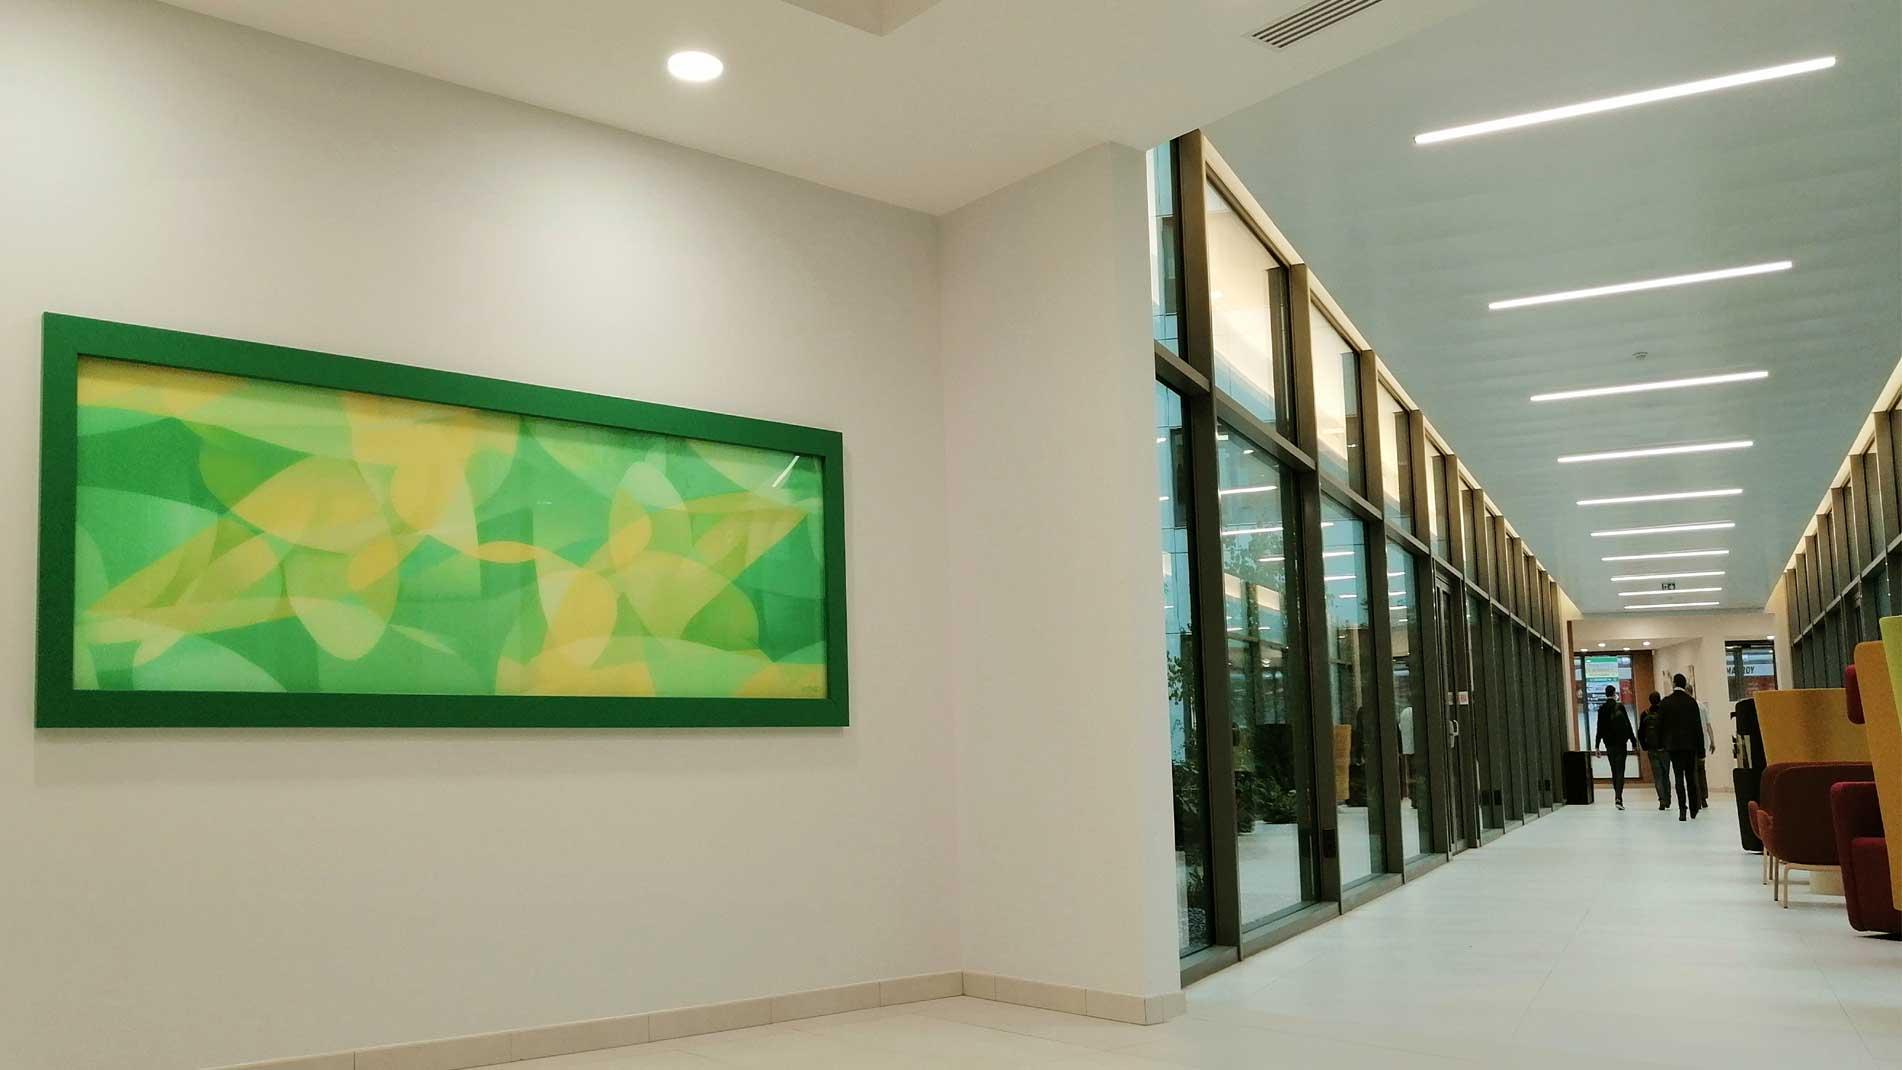 Guillaume Bottazzi, public art indoor, enamels on glass, France